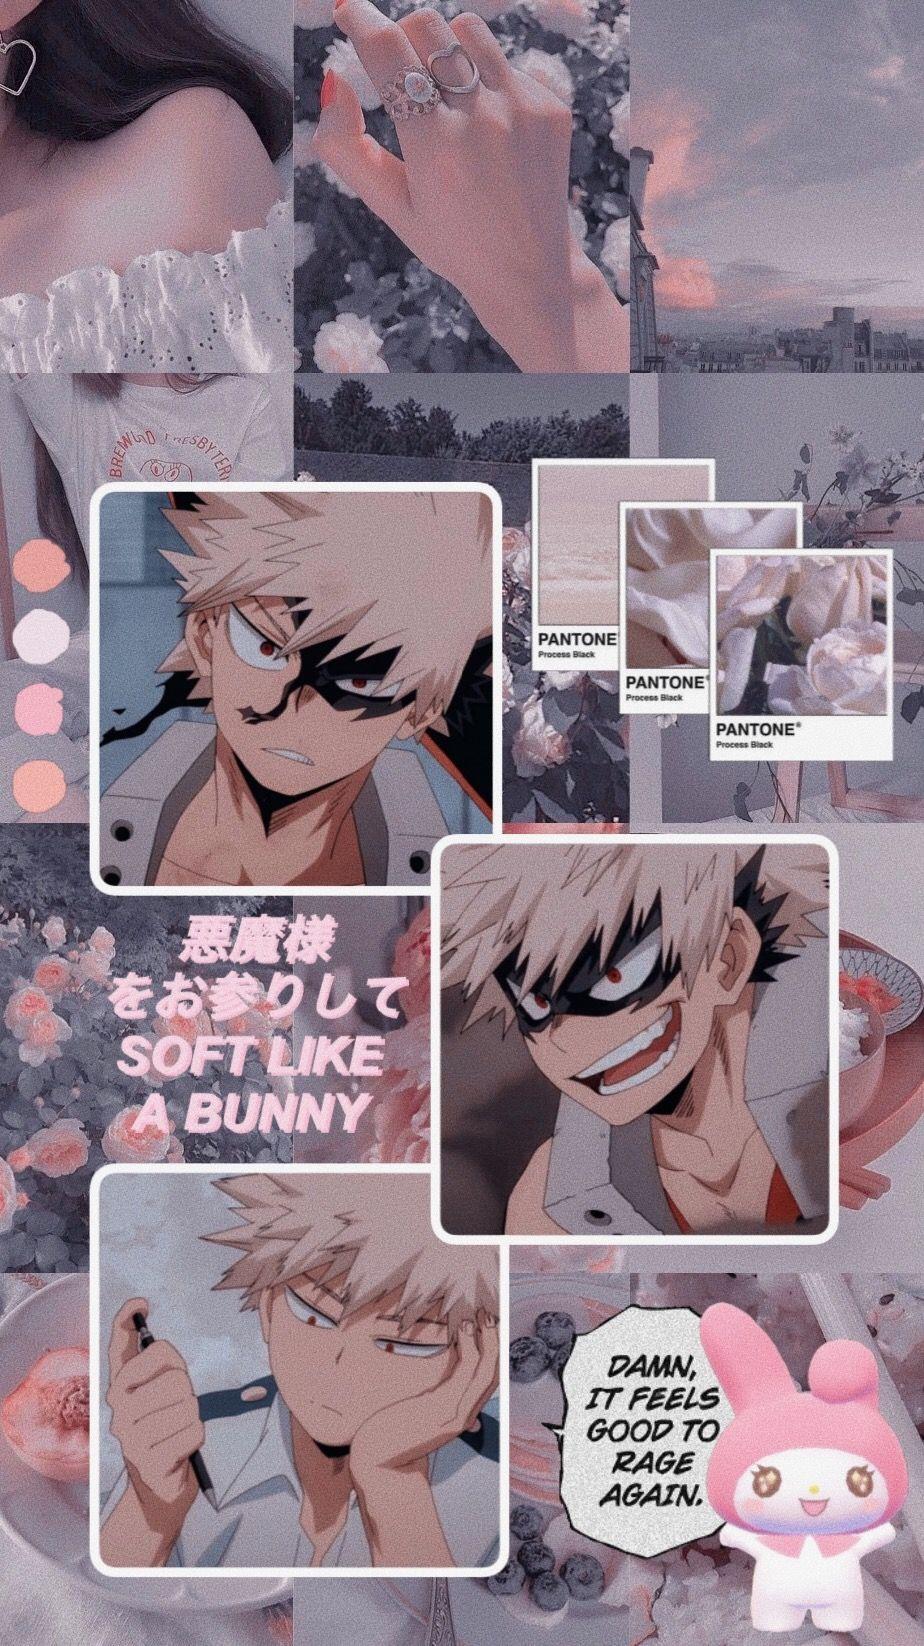 Katsuki Bakugou Aesthetic Wallpaper In 2020 Cute Anime Wallpaper Aesthetic Anime Cool Anime Wallpapers